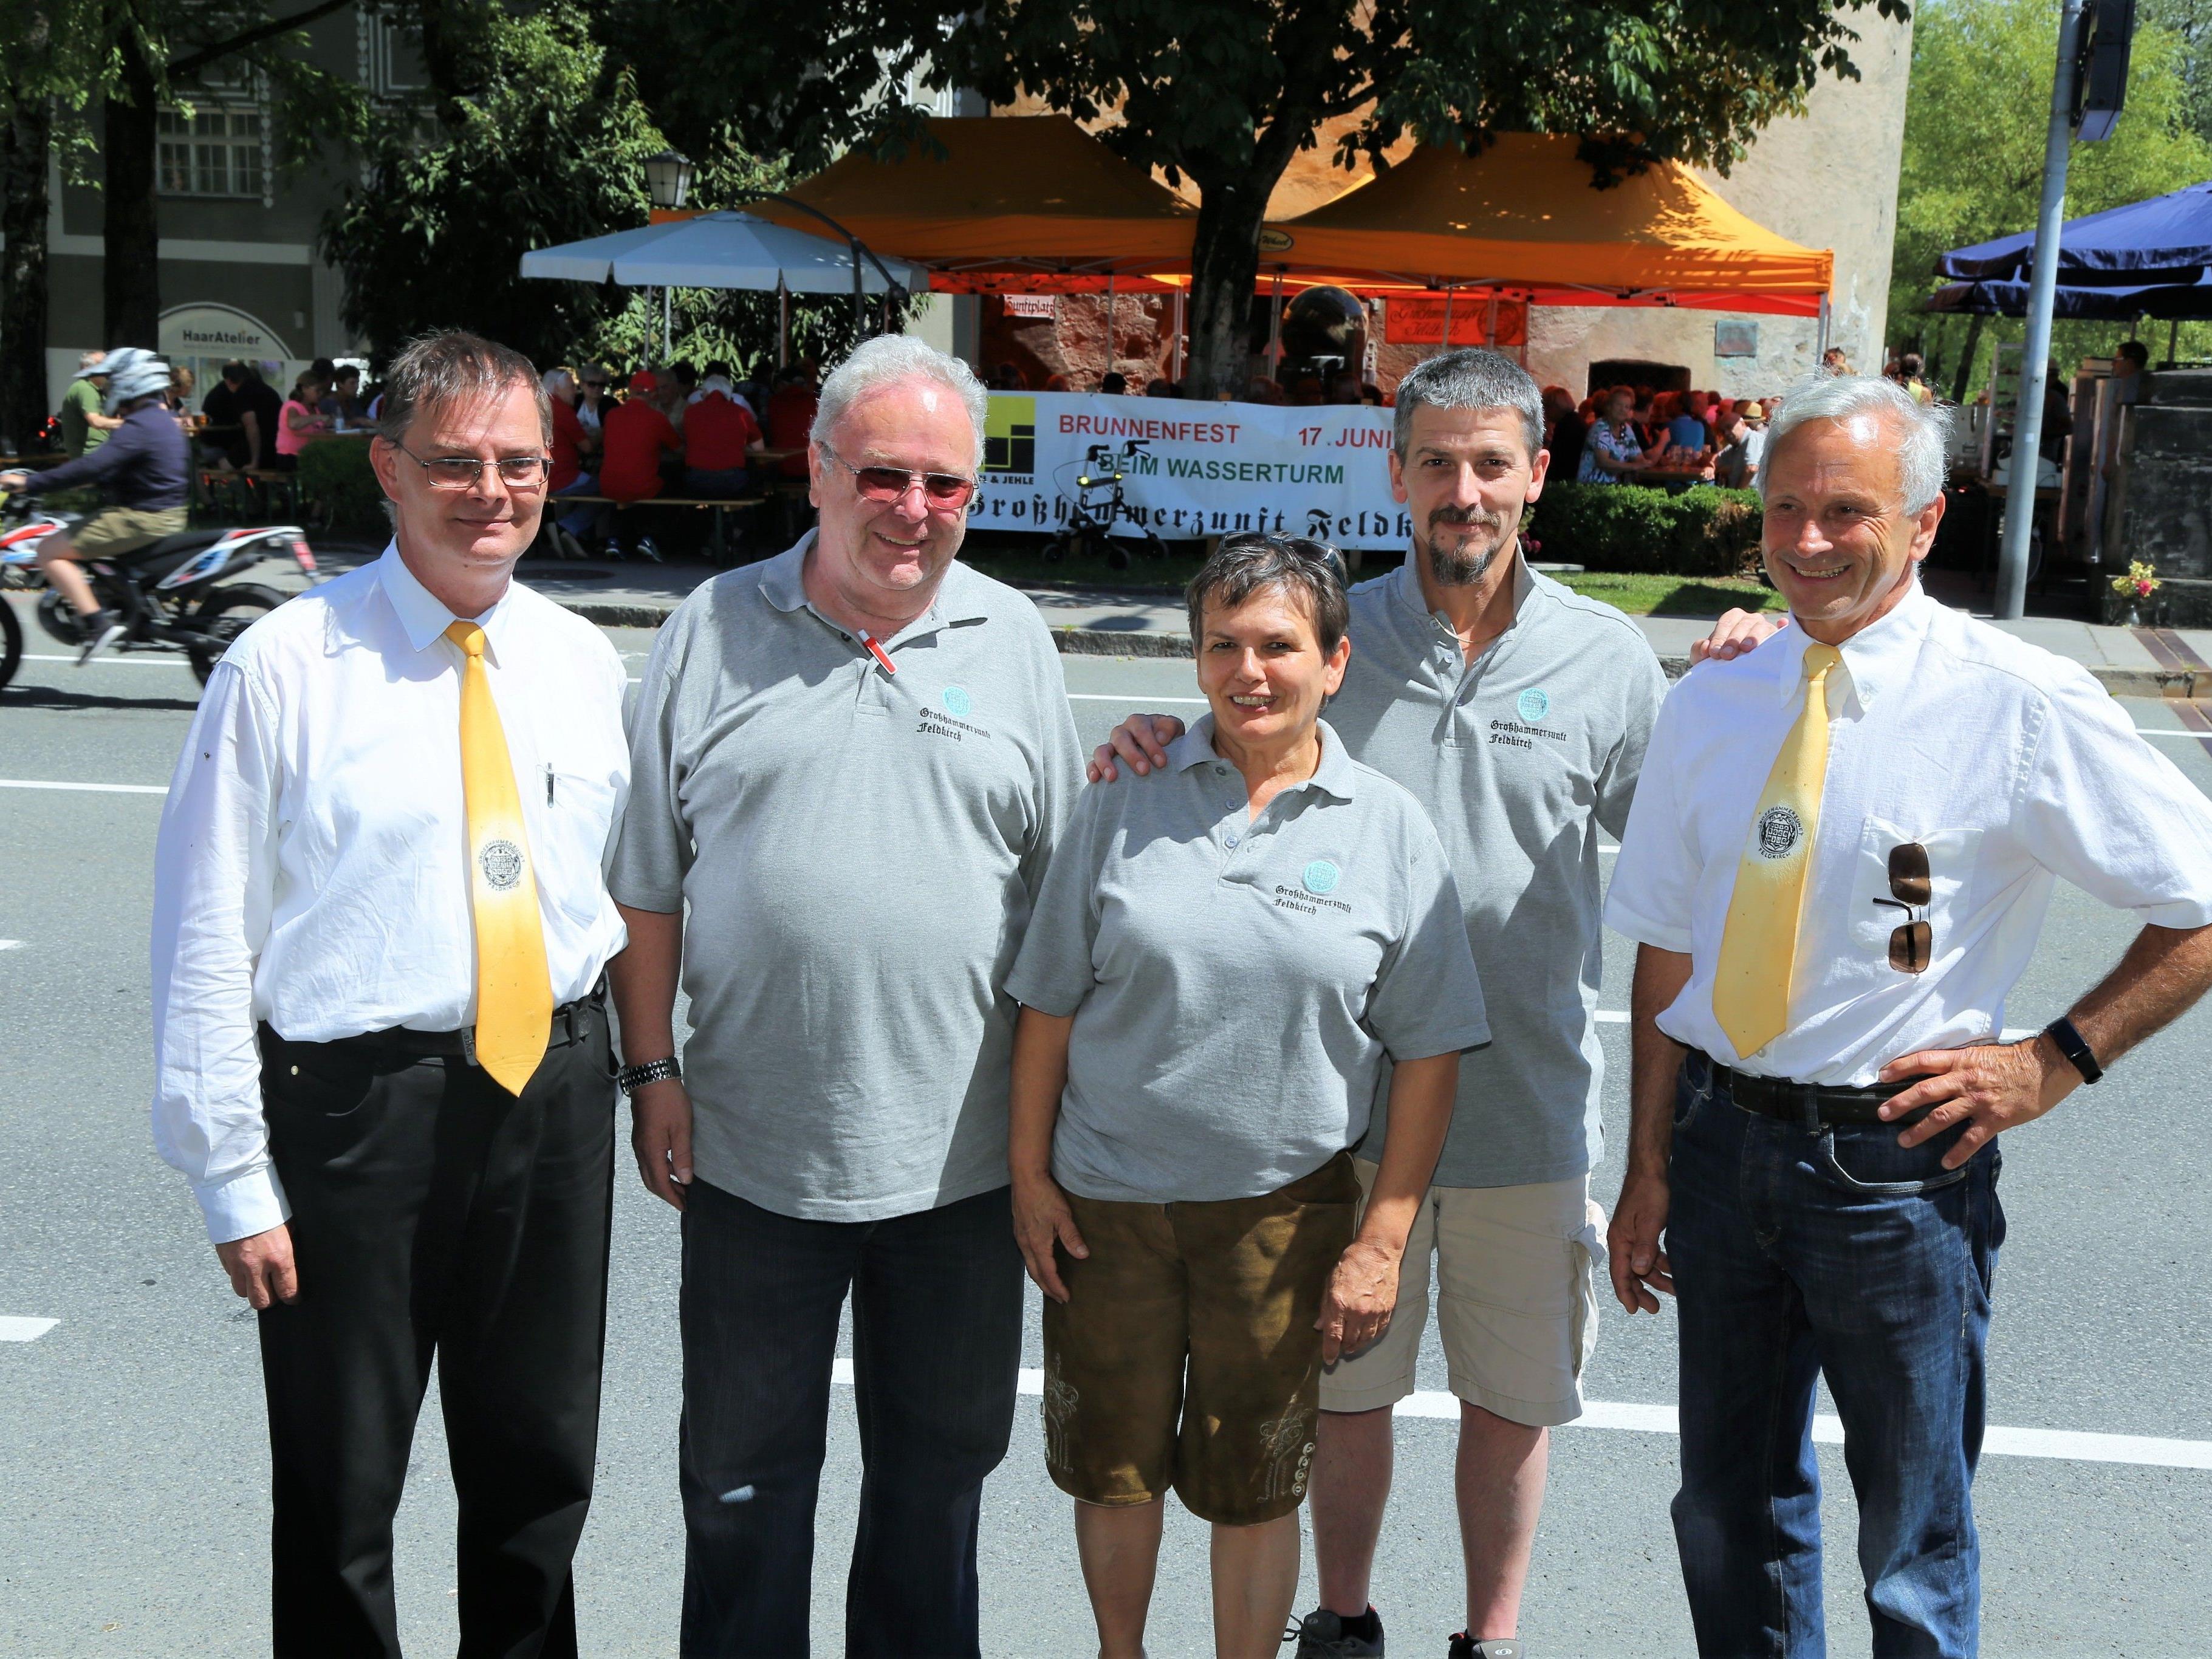 Zunftmitglieder Wolfgang Gohm, Herbert Fertl, Janette Klotz, Florian Stadelbauer und Kerzenmeister Herbert Scheuch (v. l.).